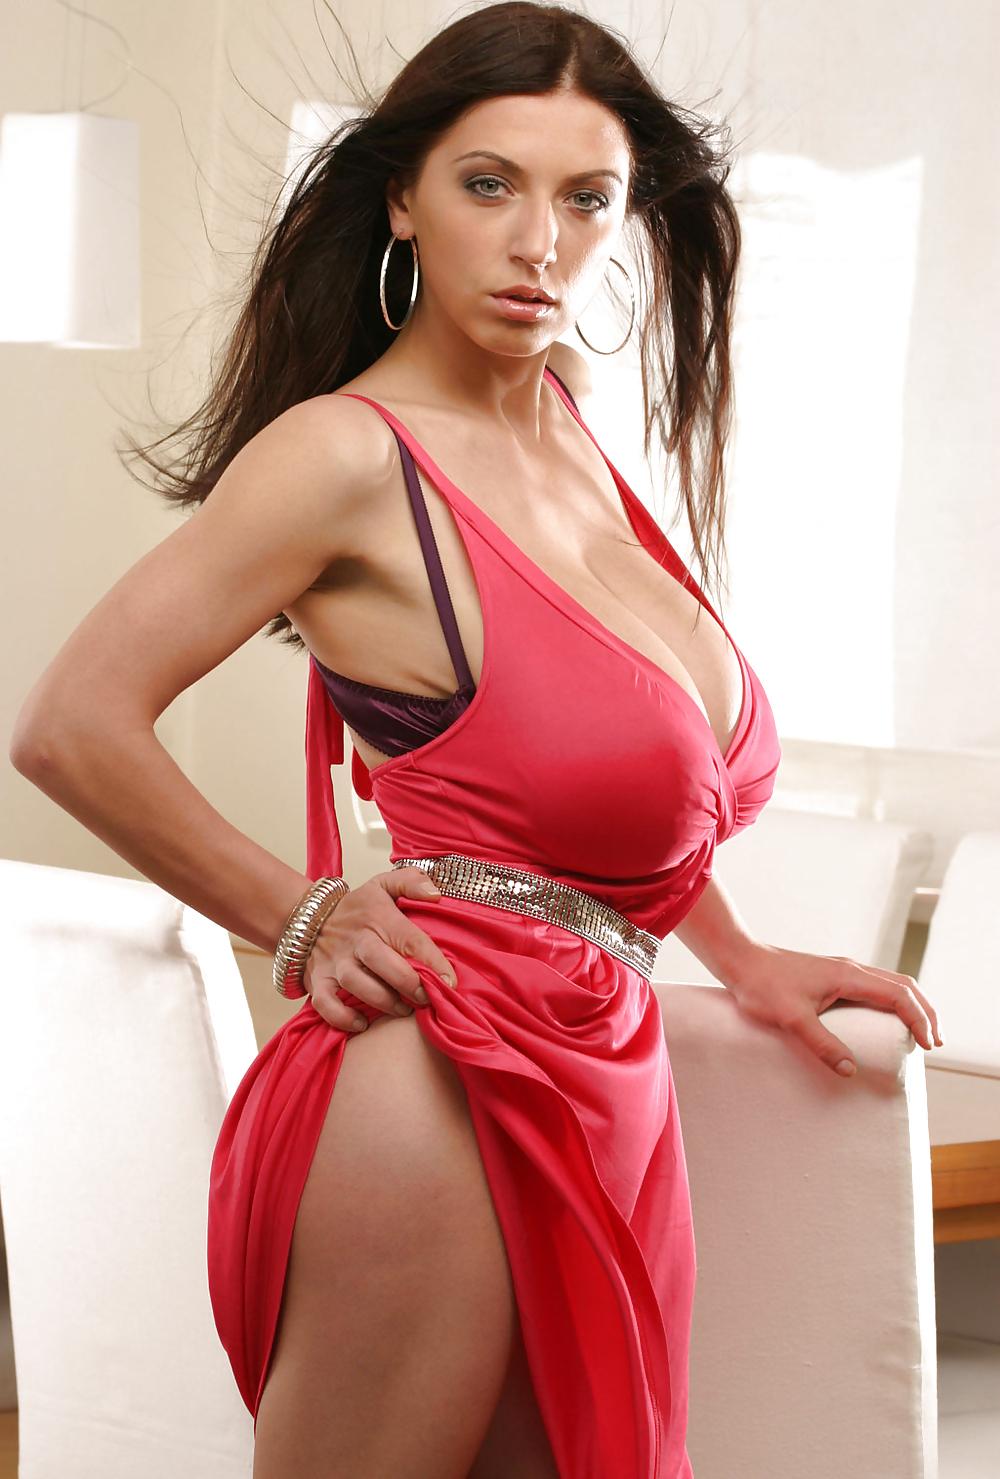 anya-sakova-big-boob-pics